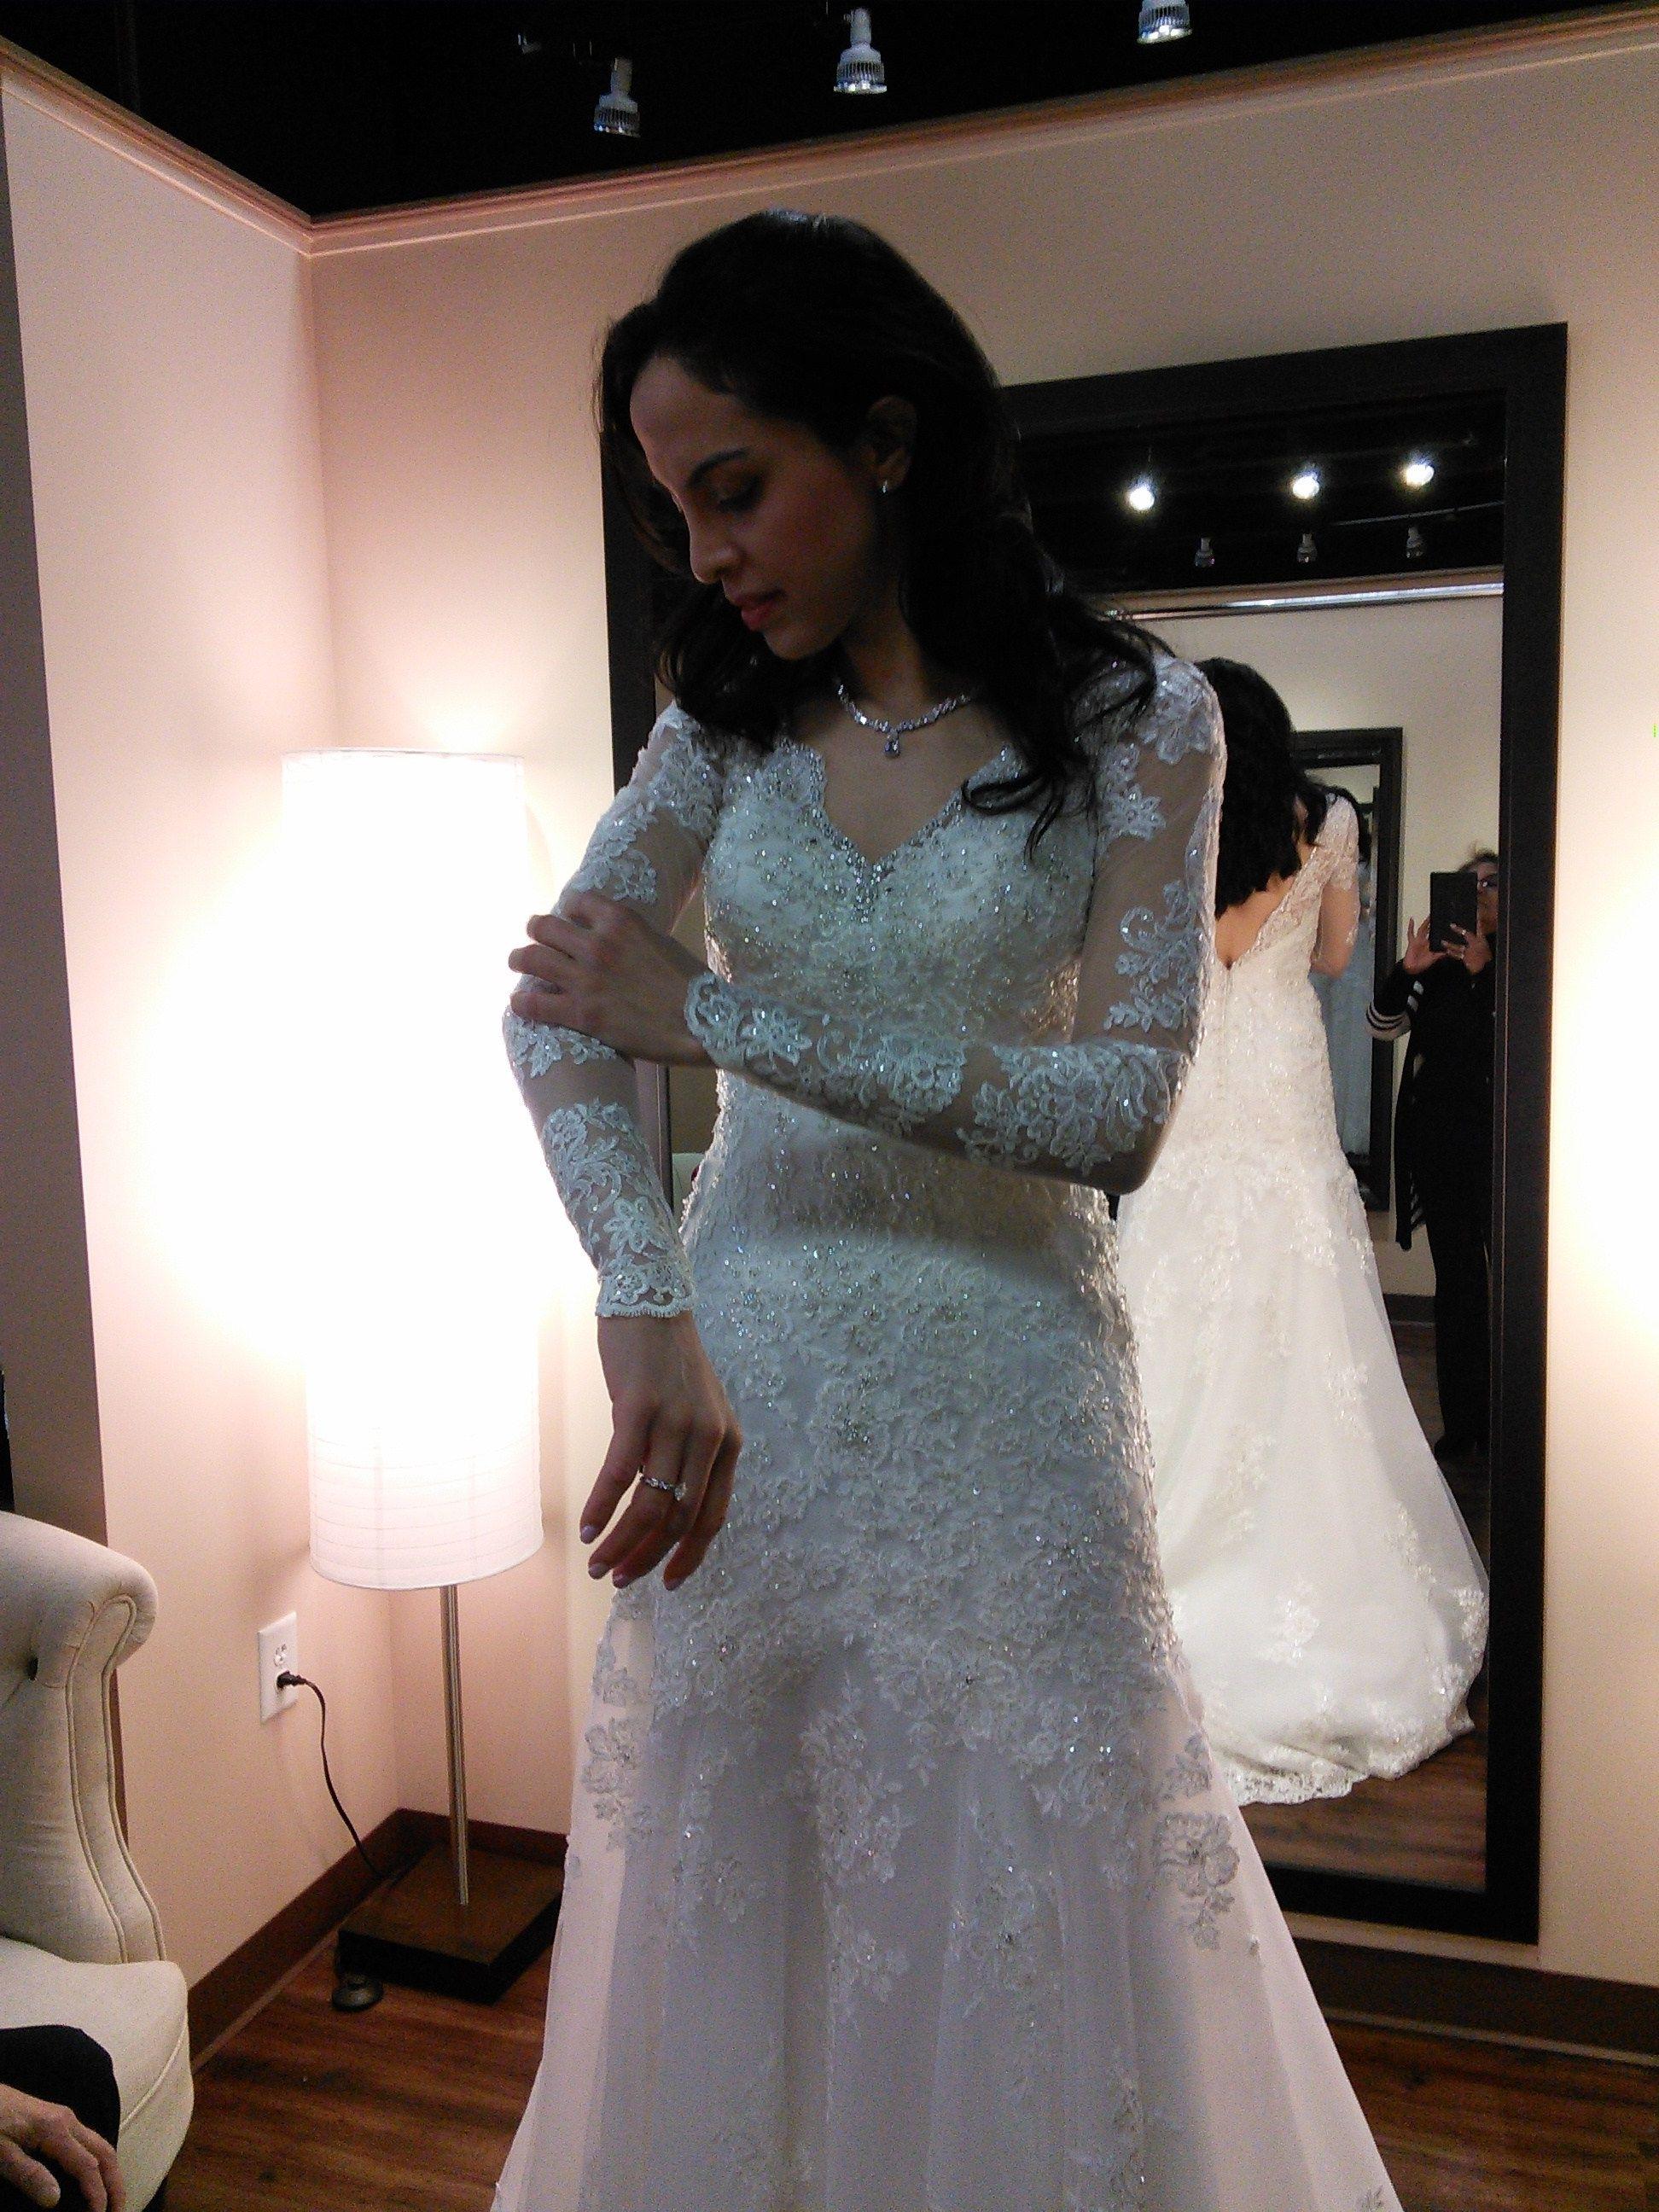 Wedding Dress Alterations Savannah Ga | Wedding Dress | Pinterest ...